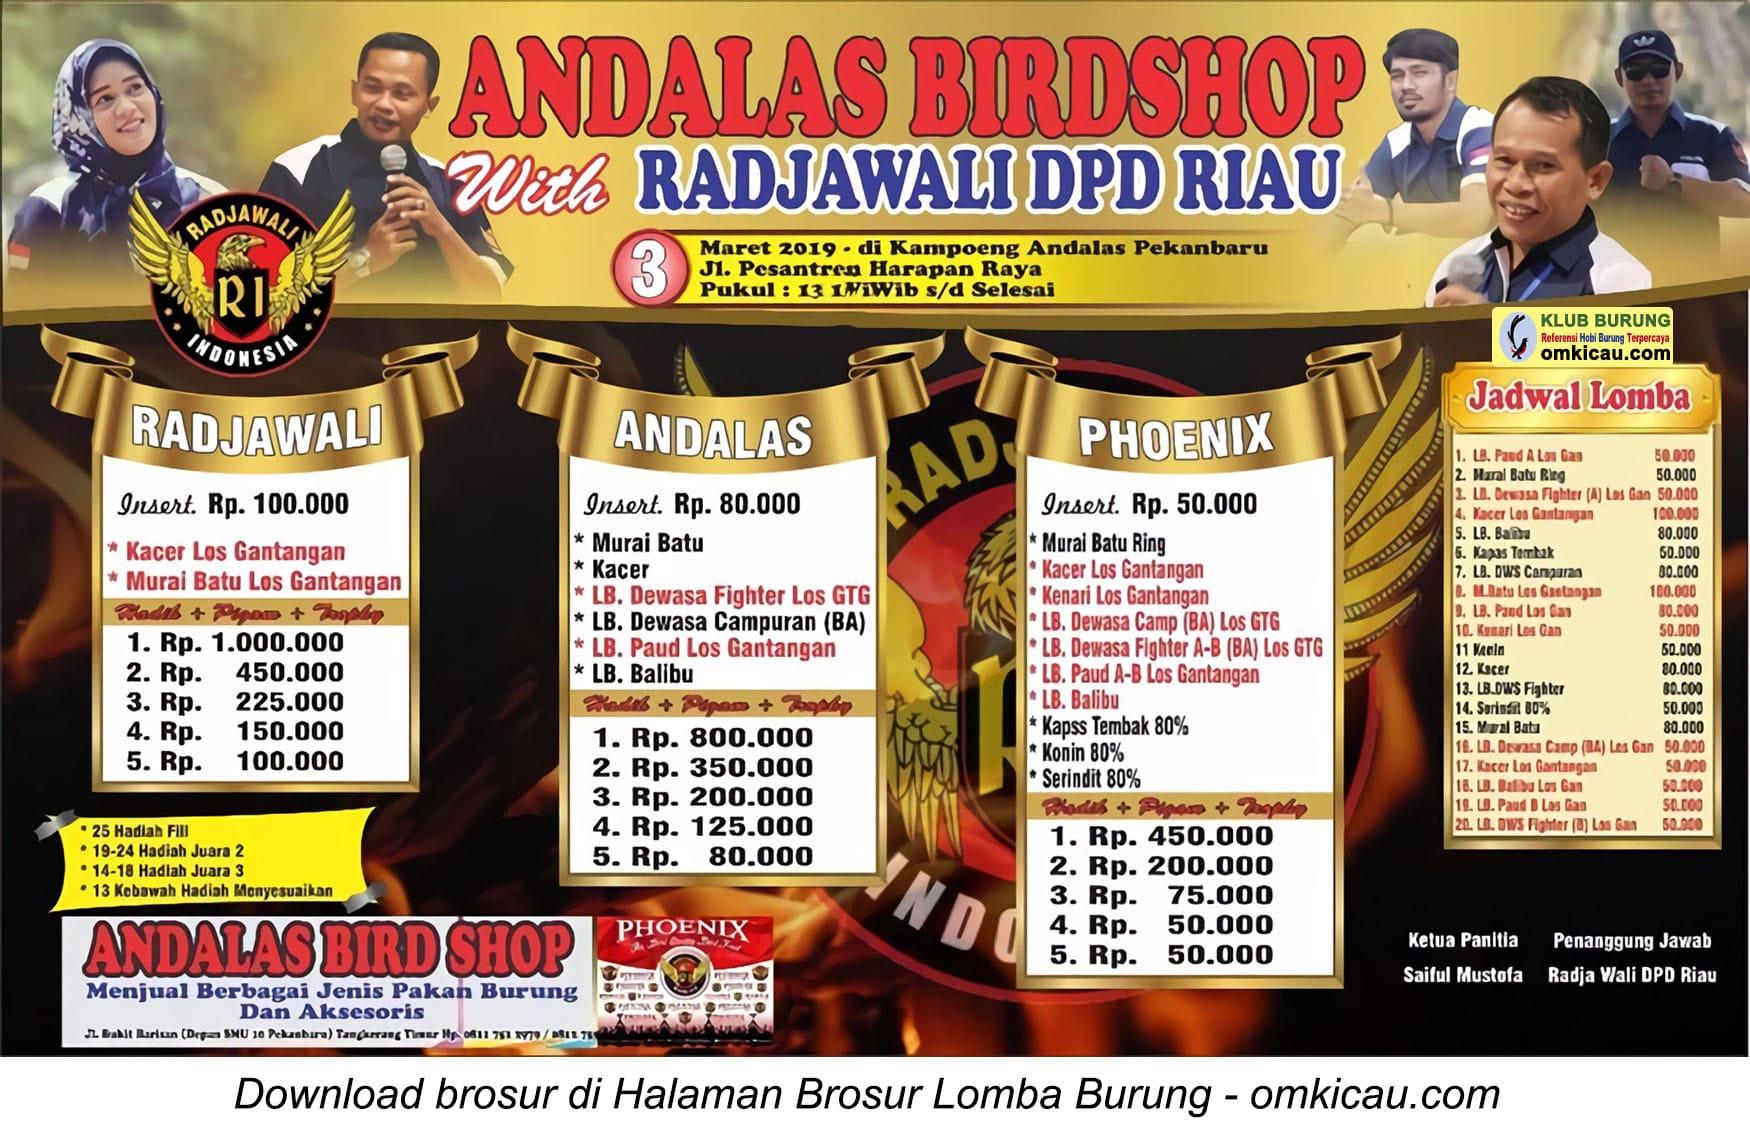 Andalas Birdshop